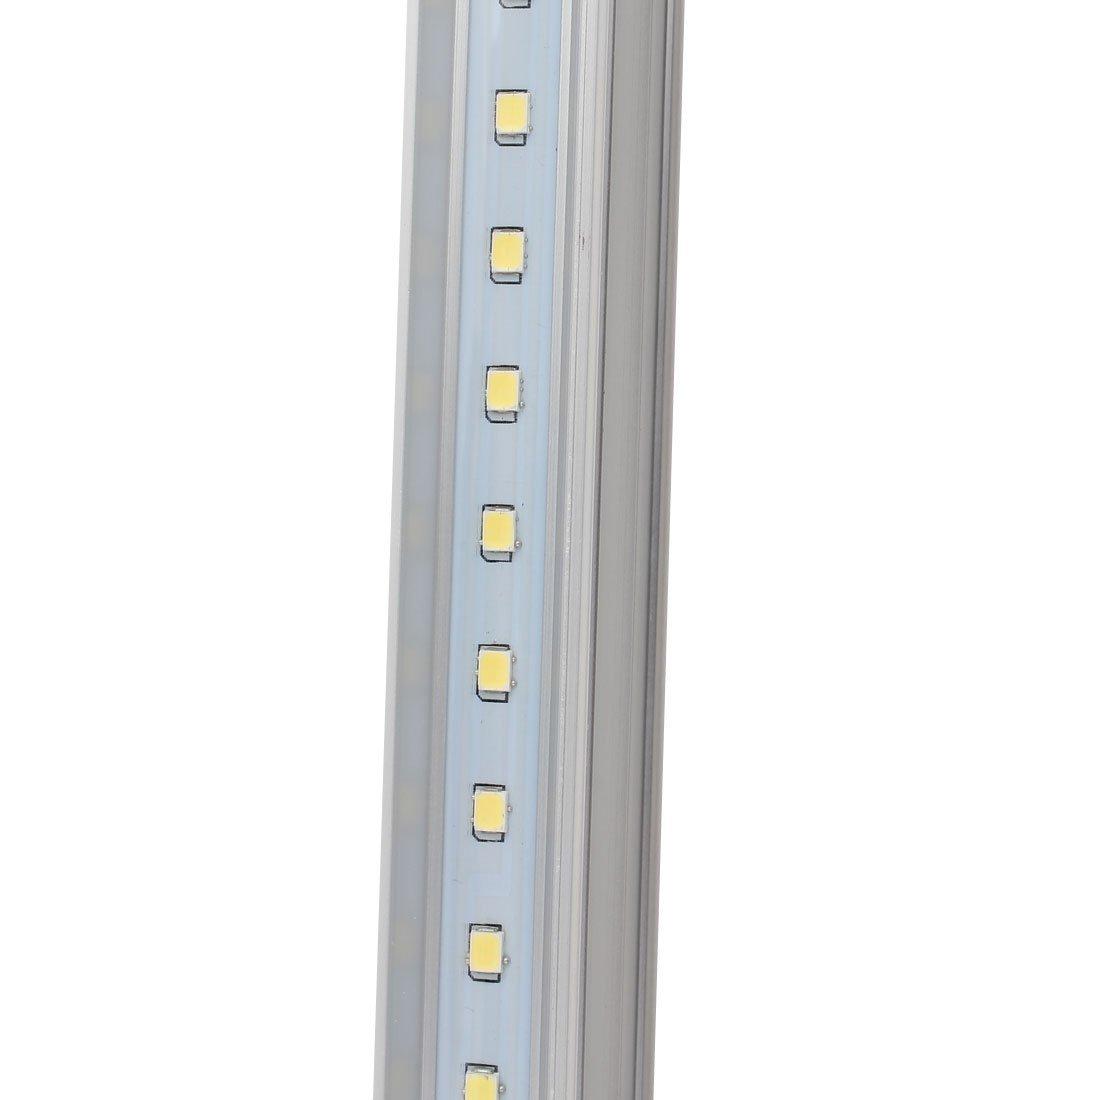 eDealMax CA 85-265V 9W T5 2835SMD LED integrada tubo de la lámpara de luz Blanca pura 60cm Longitud: Amazon.com: Industrial & Scientific